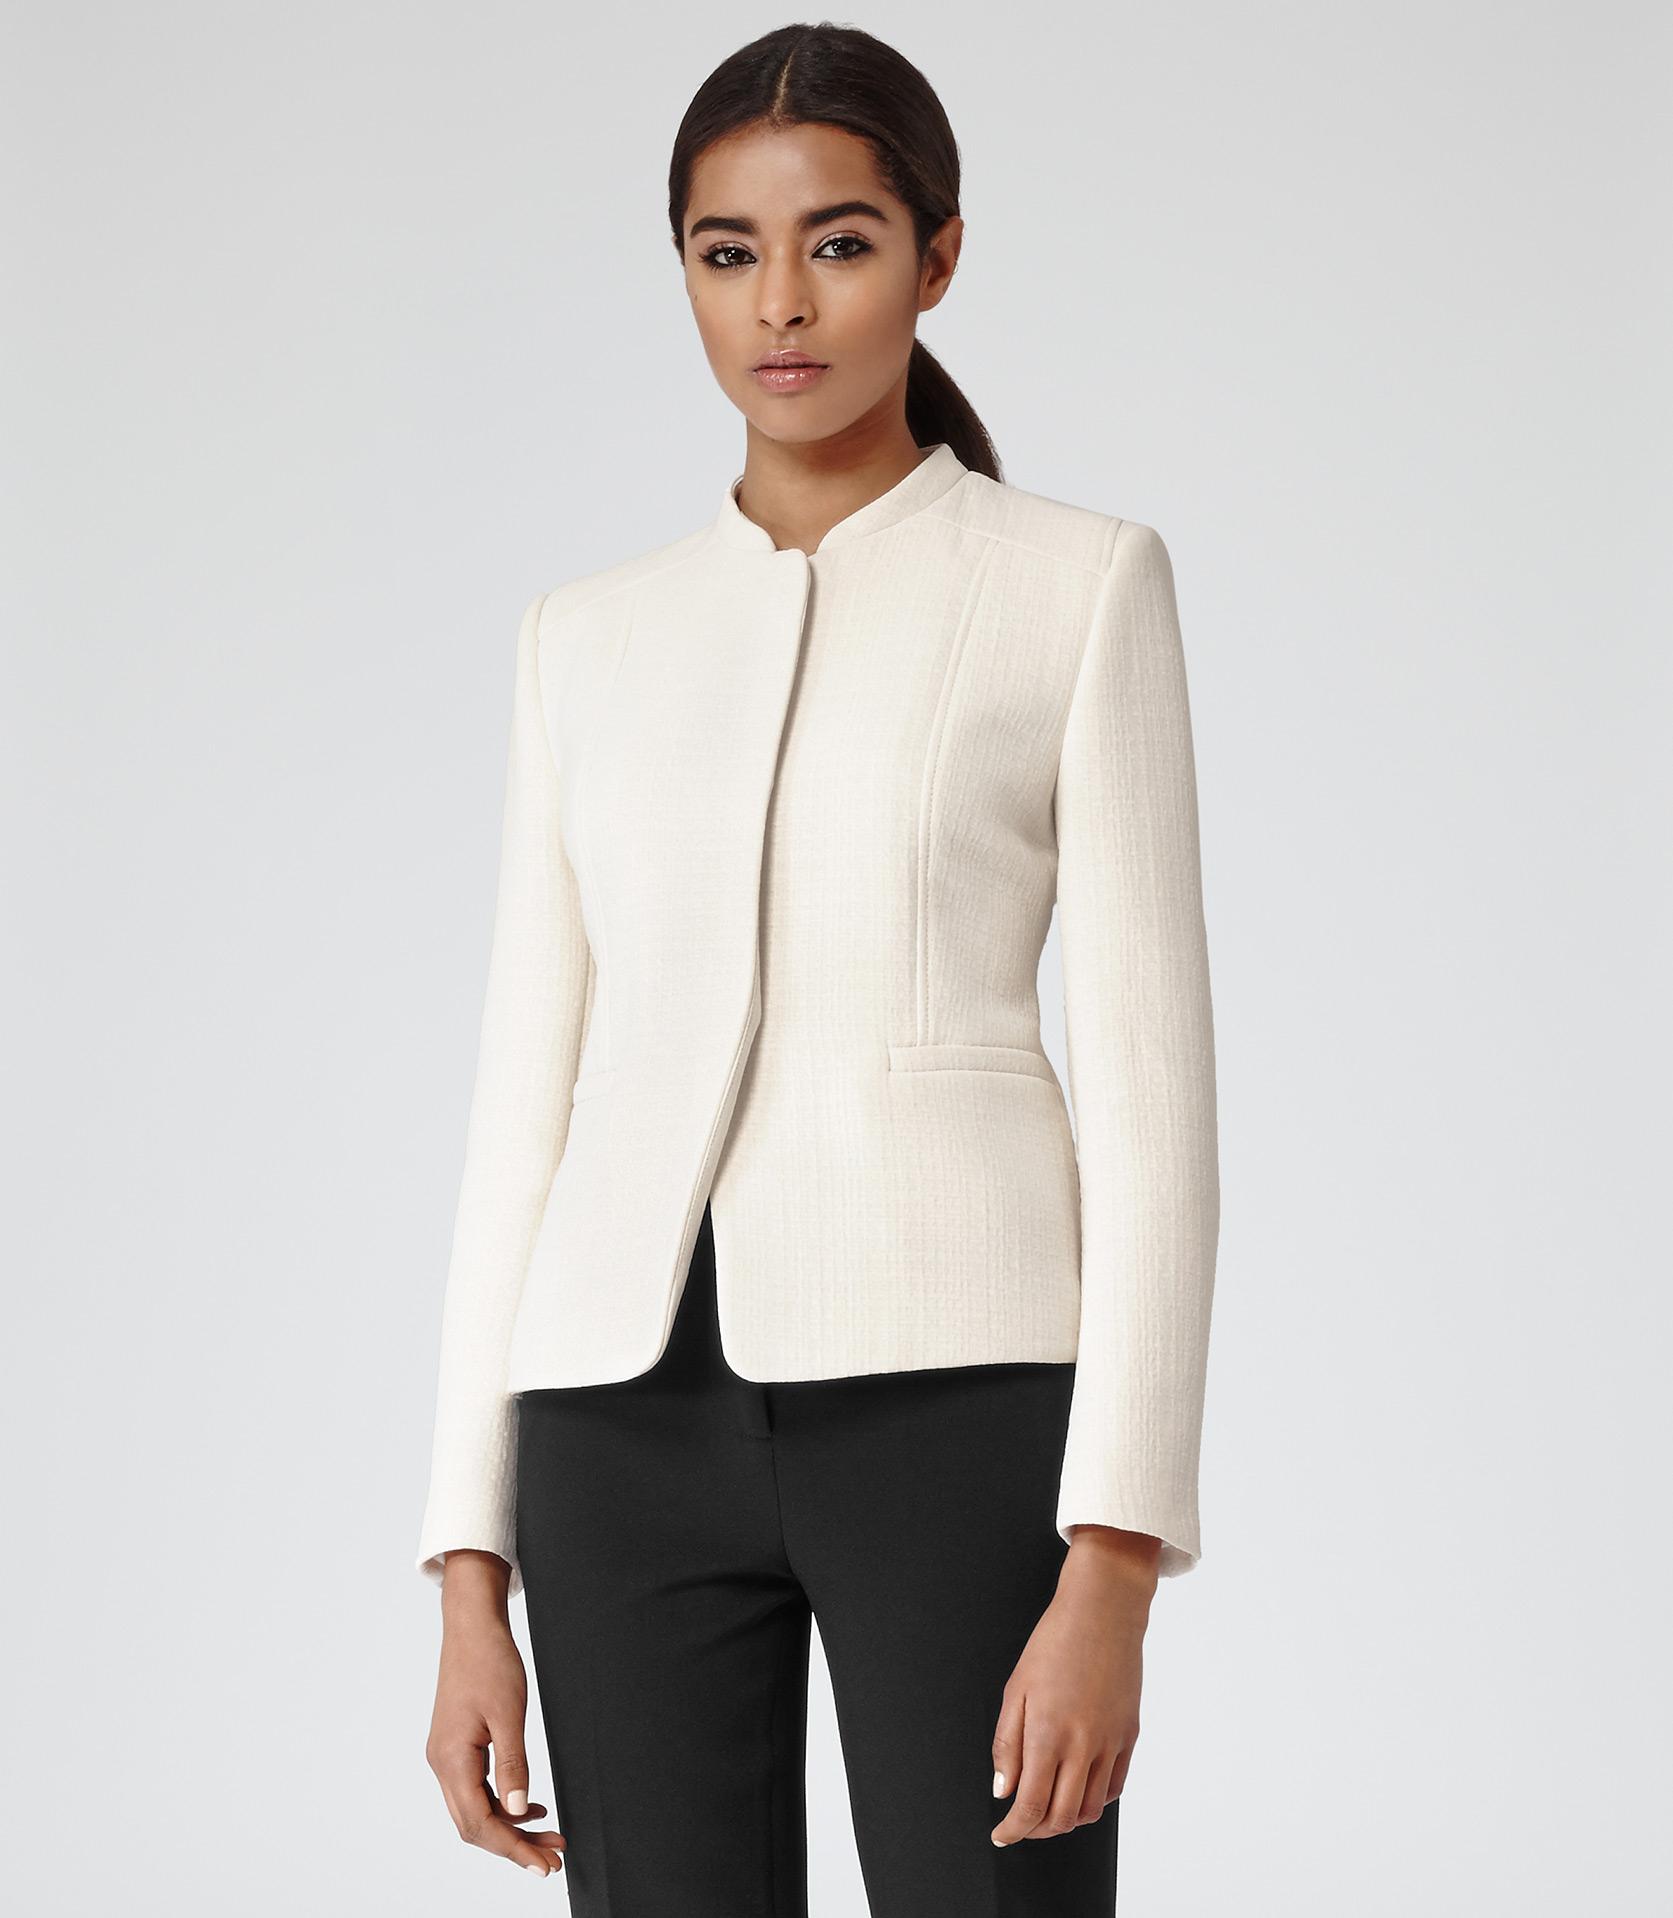 Reiss Juliette Textured Short Jacket in Natural | Lyst